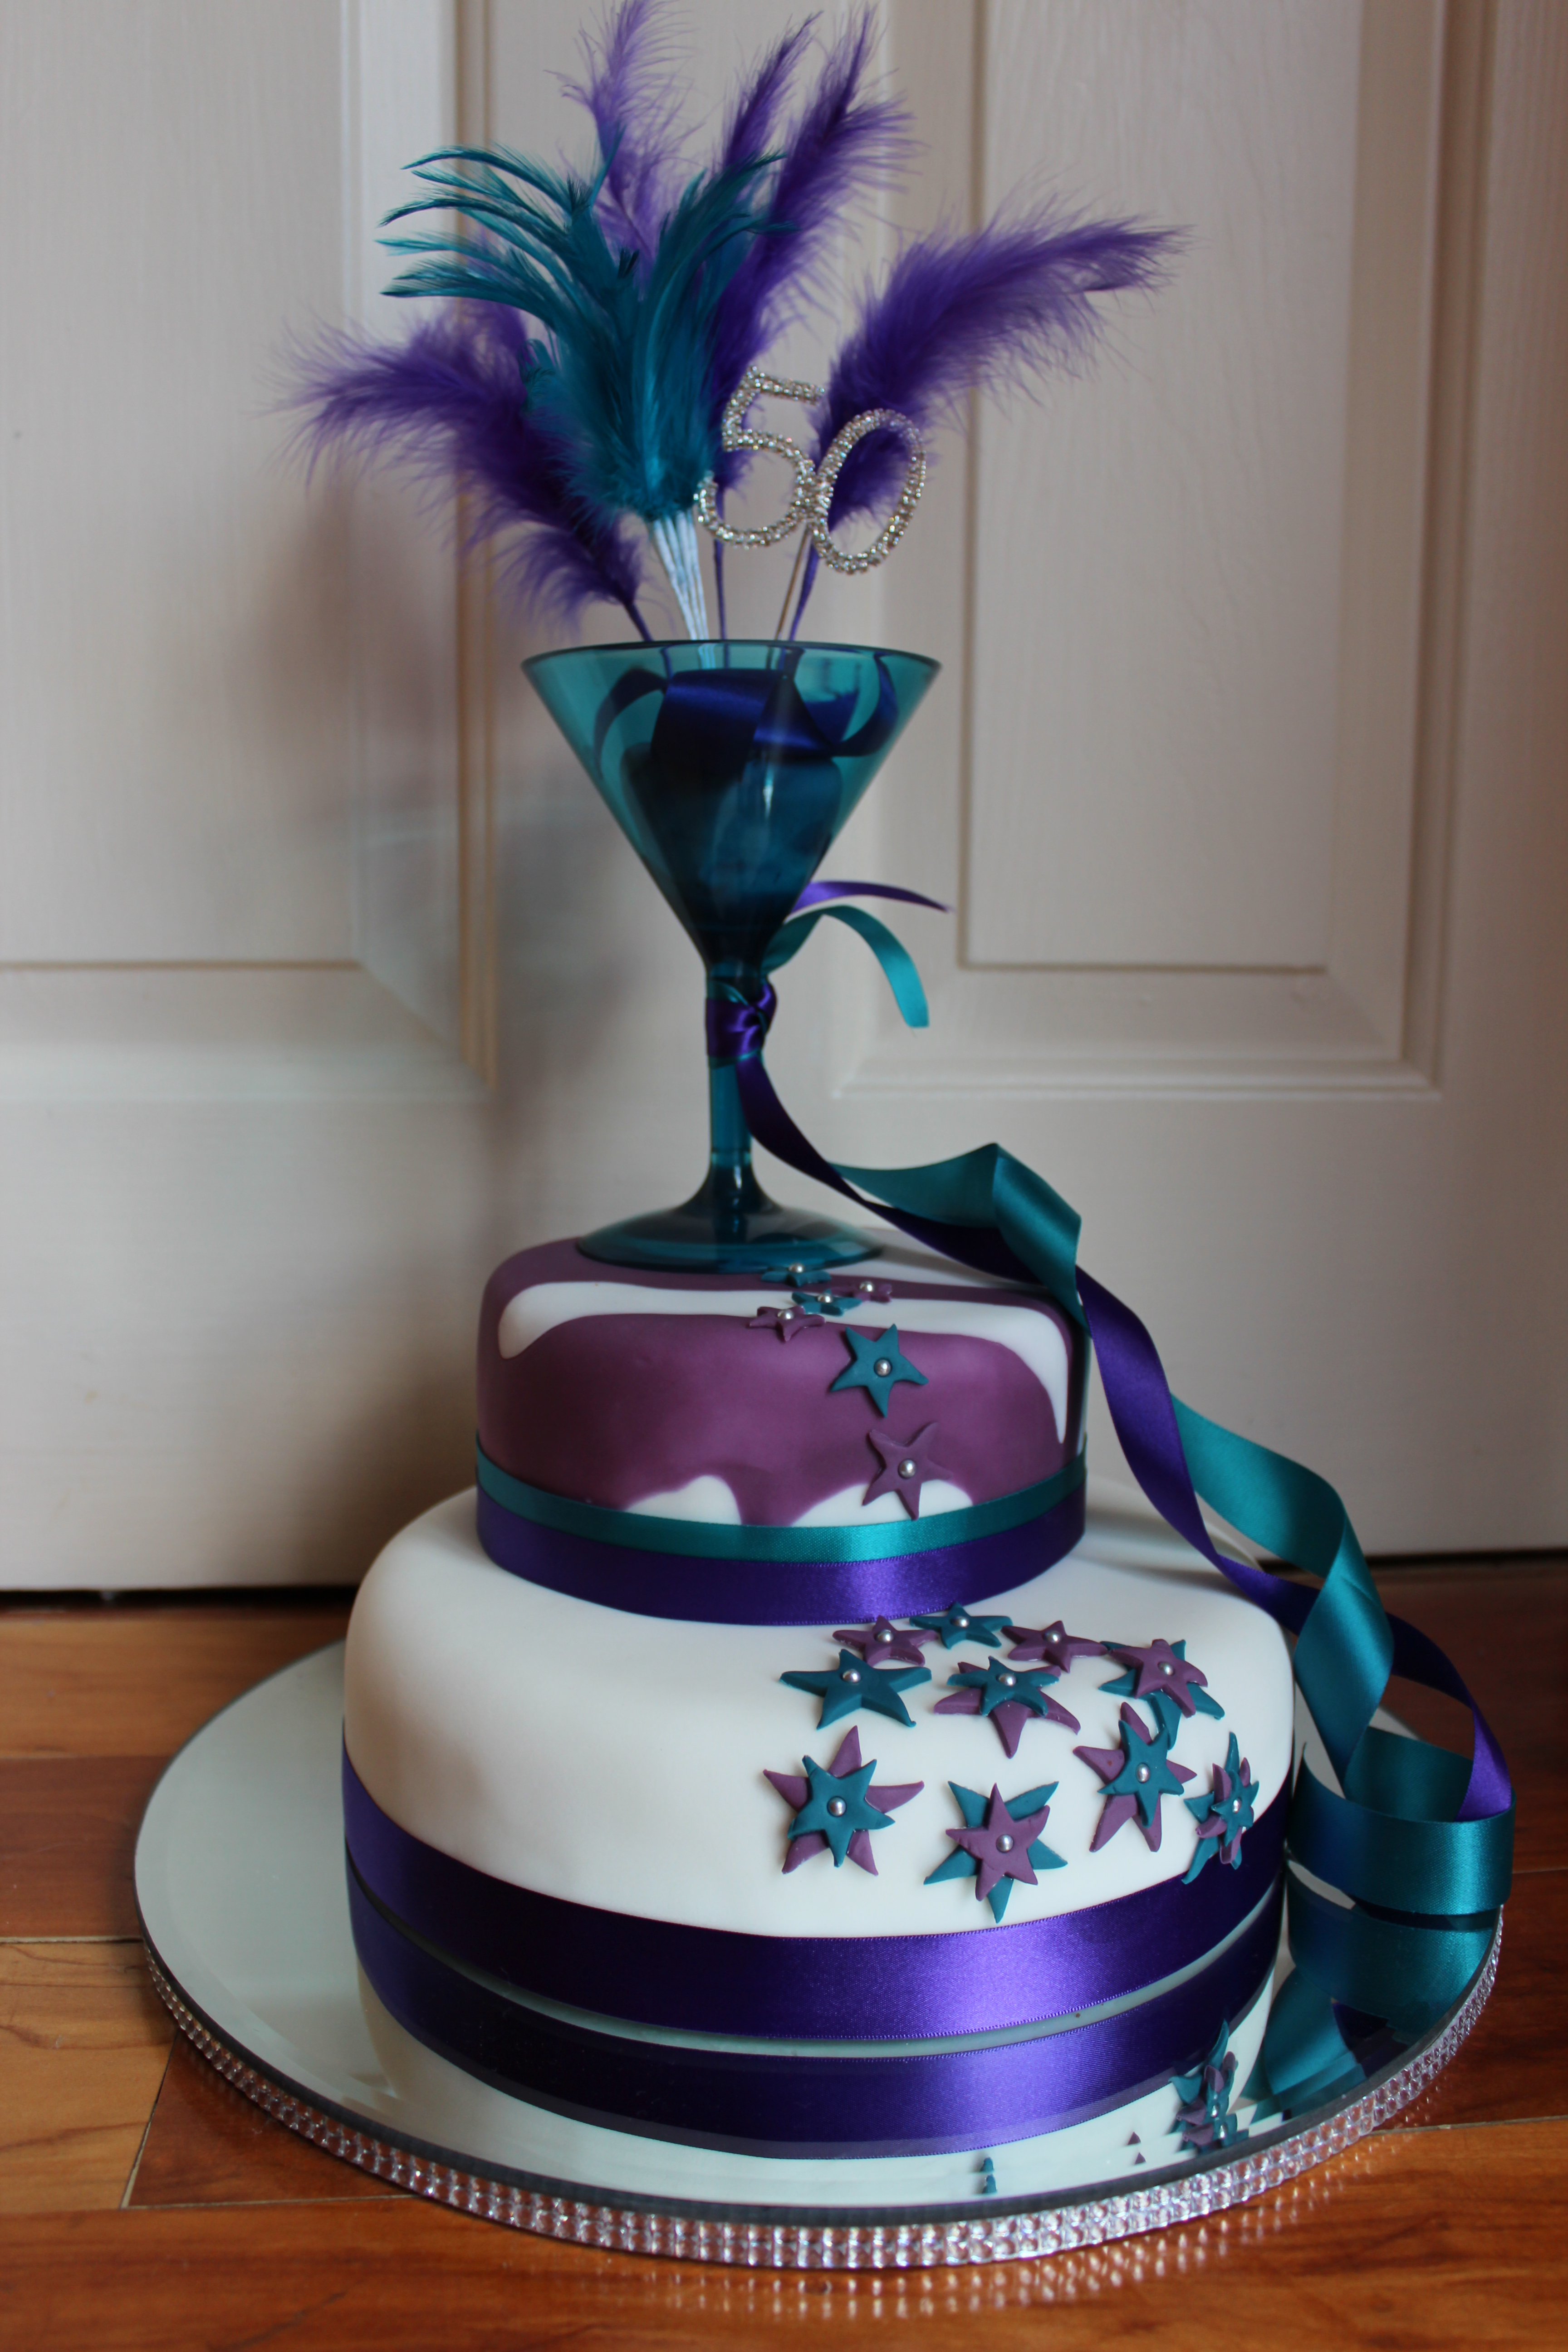 How To Level  Torte A Cake Wilton